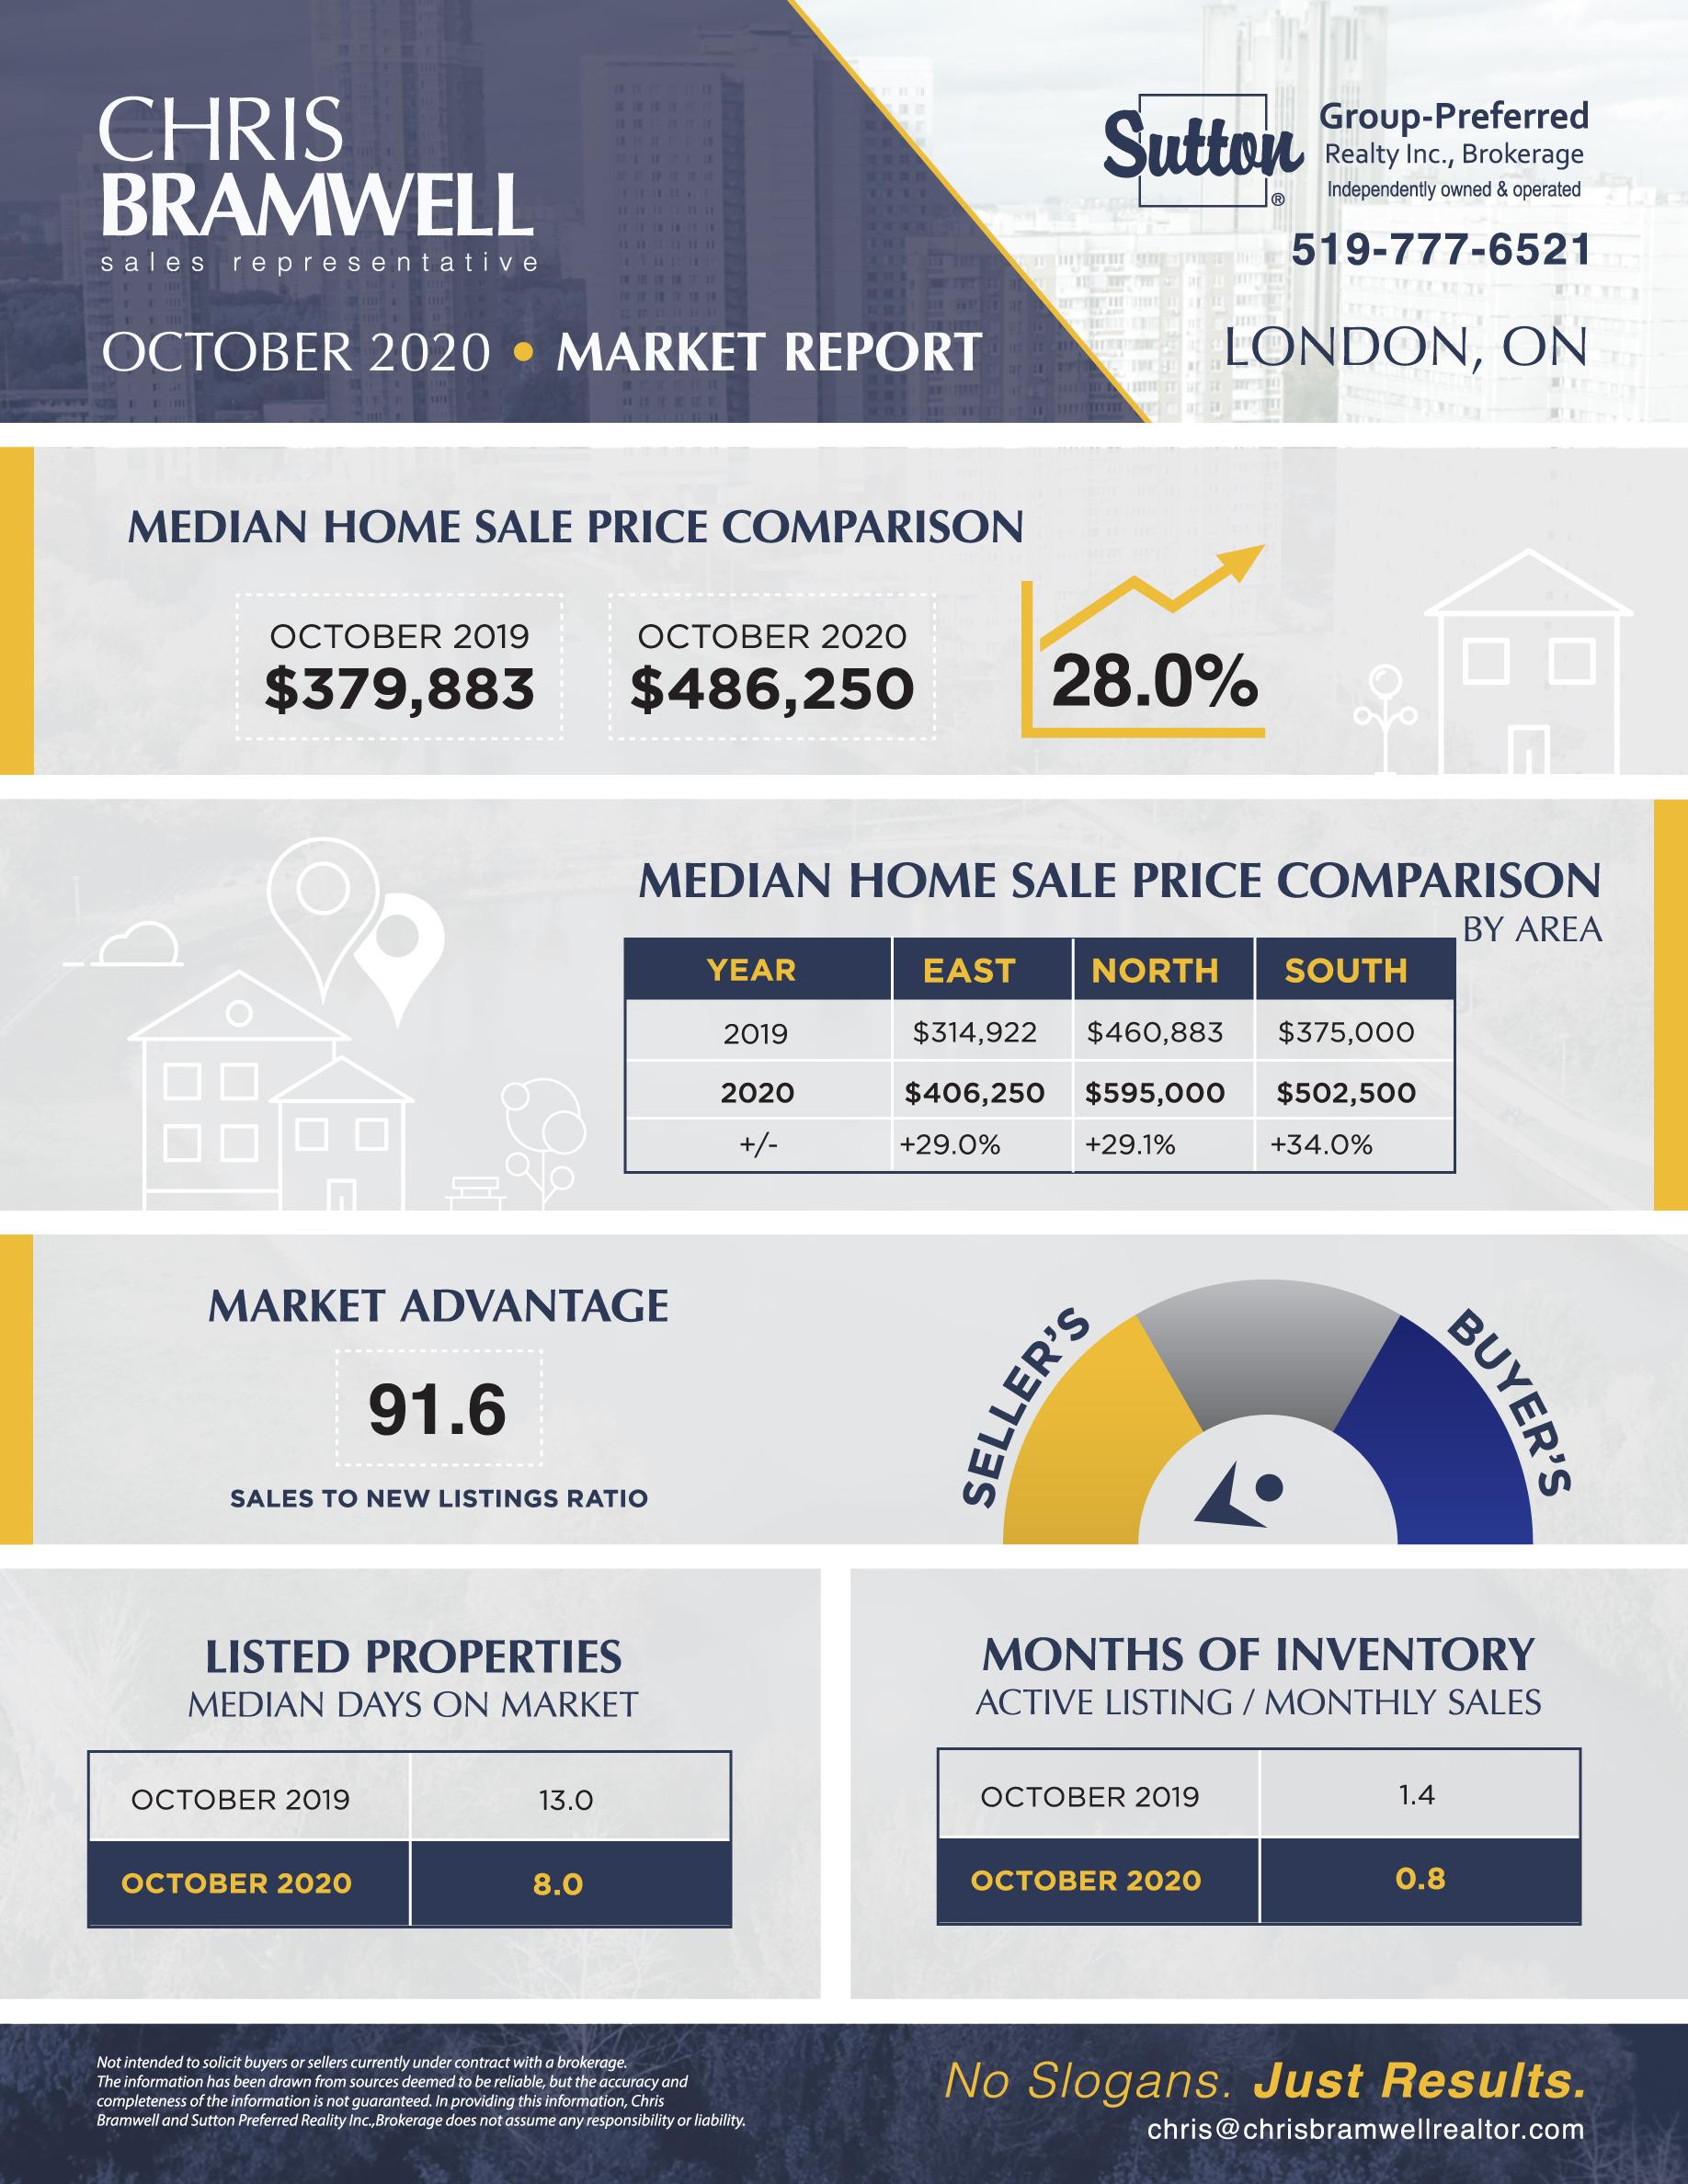 Chris Bramwell Market Report October 2020